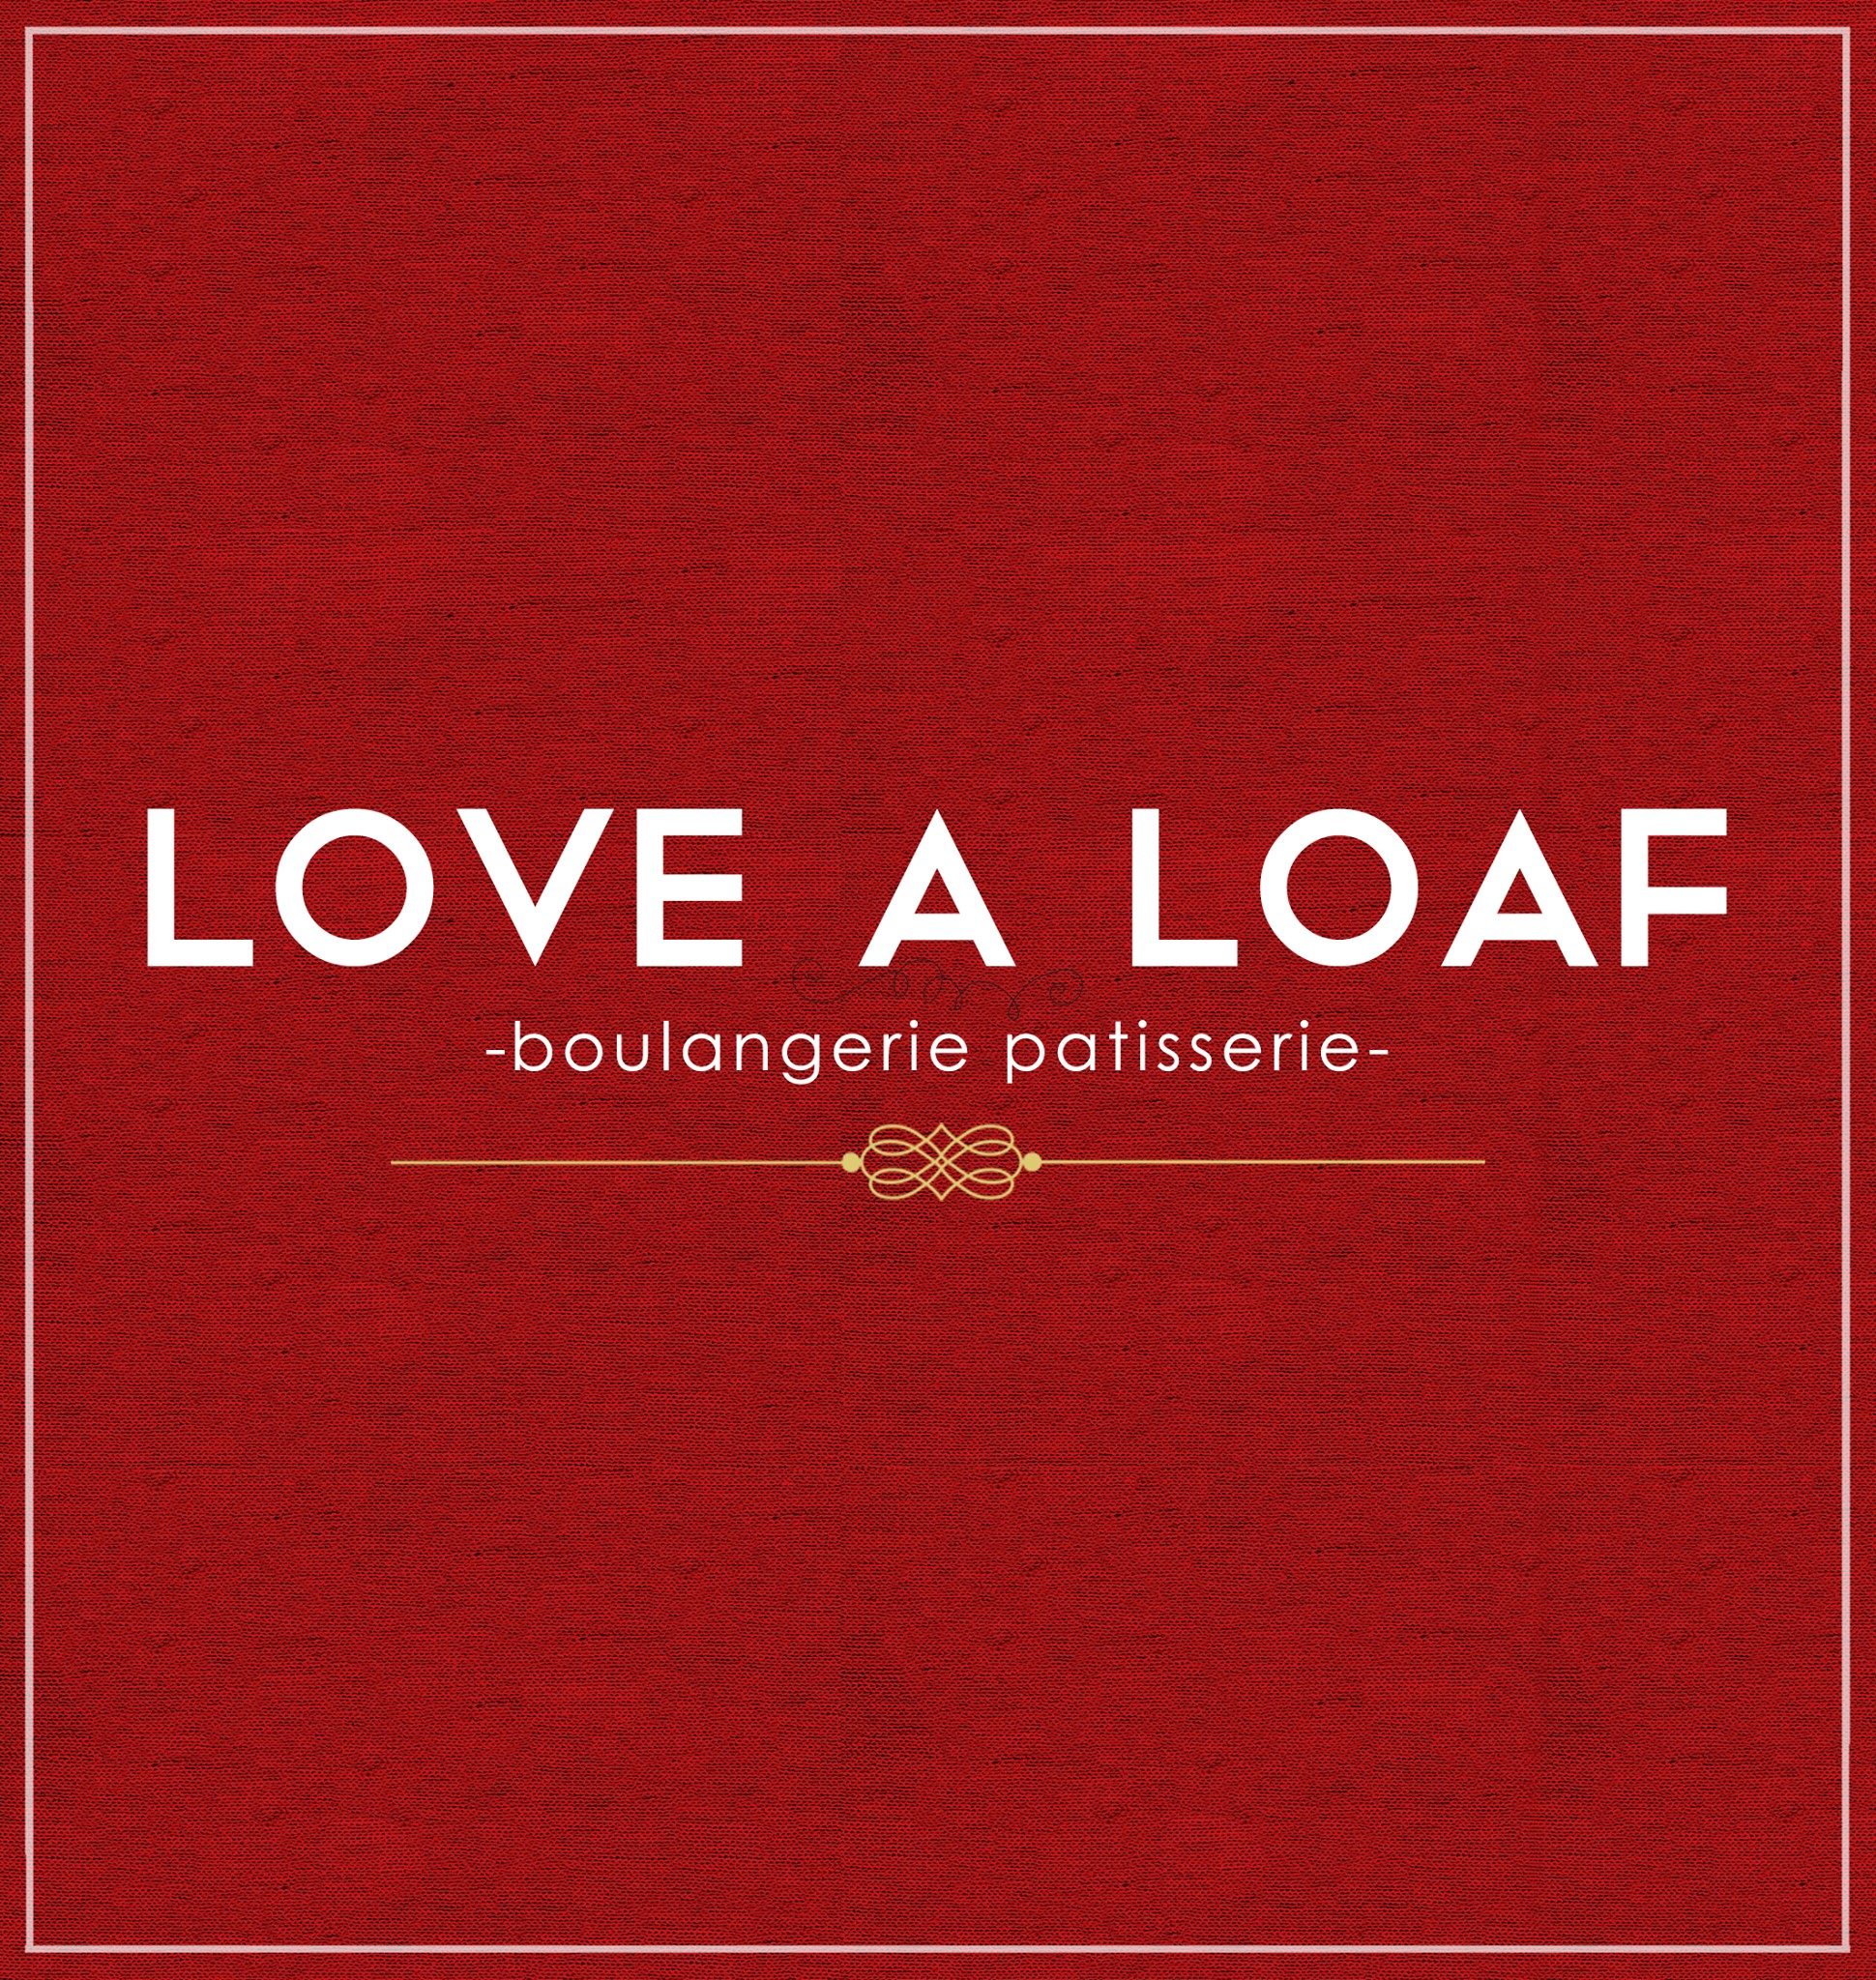 LOVE A LOAF BAKERY CAFE